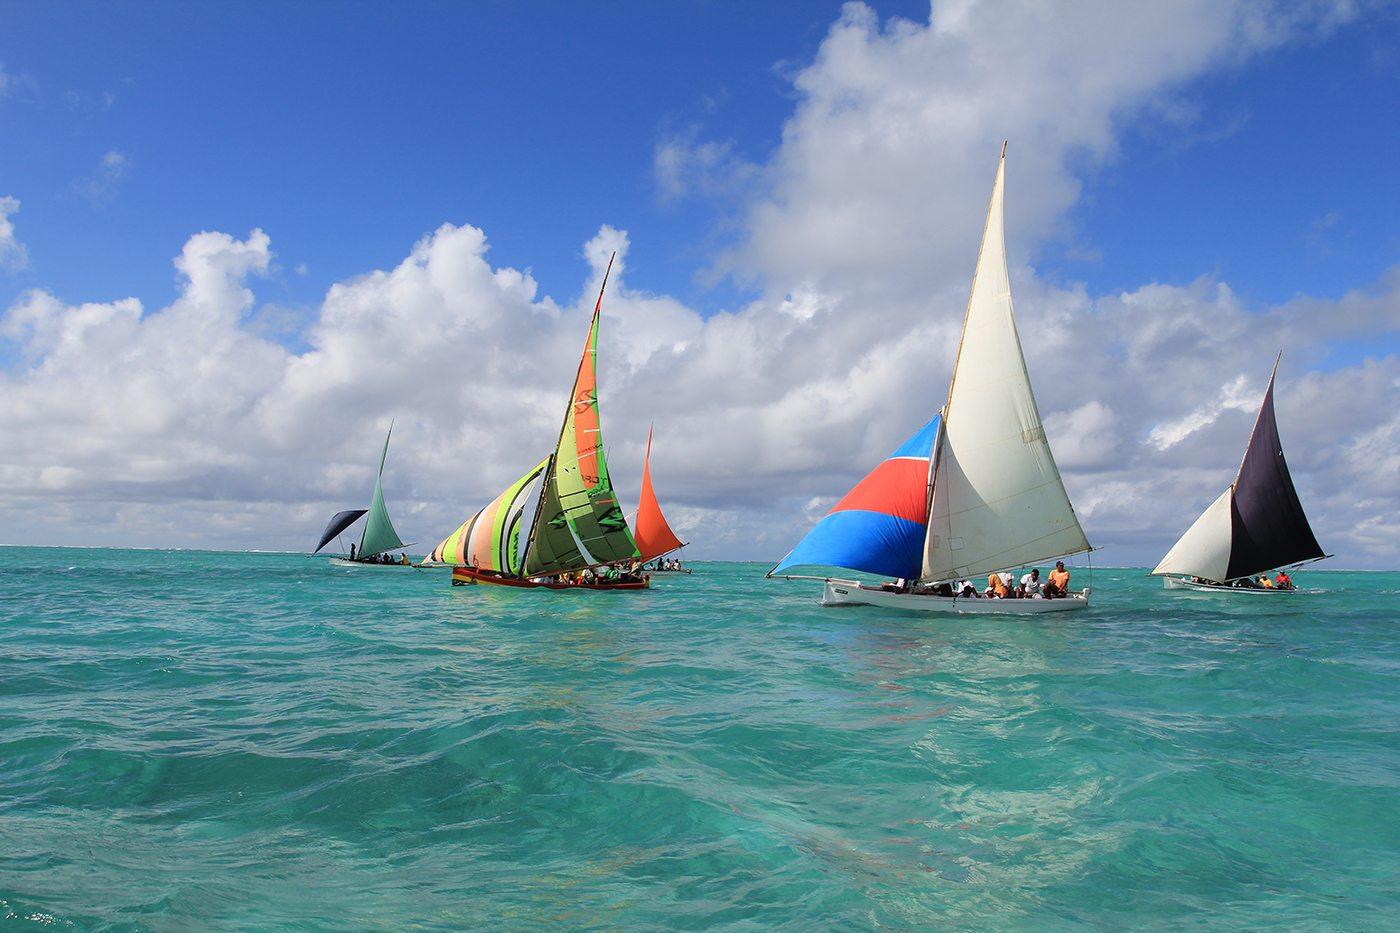 traditionalsailingboats